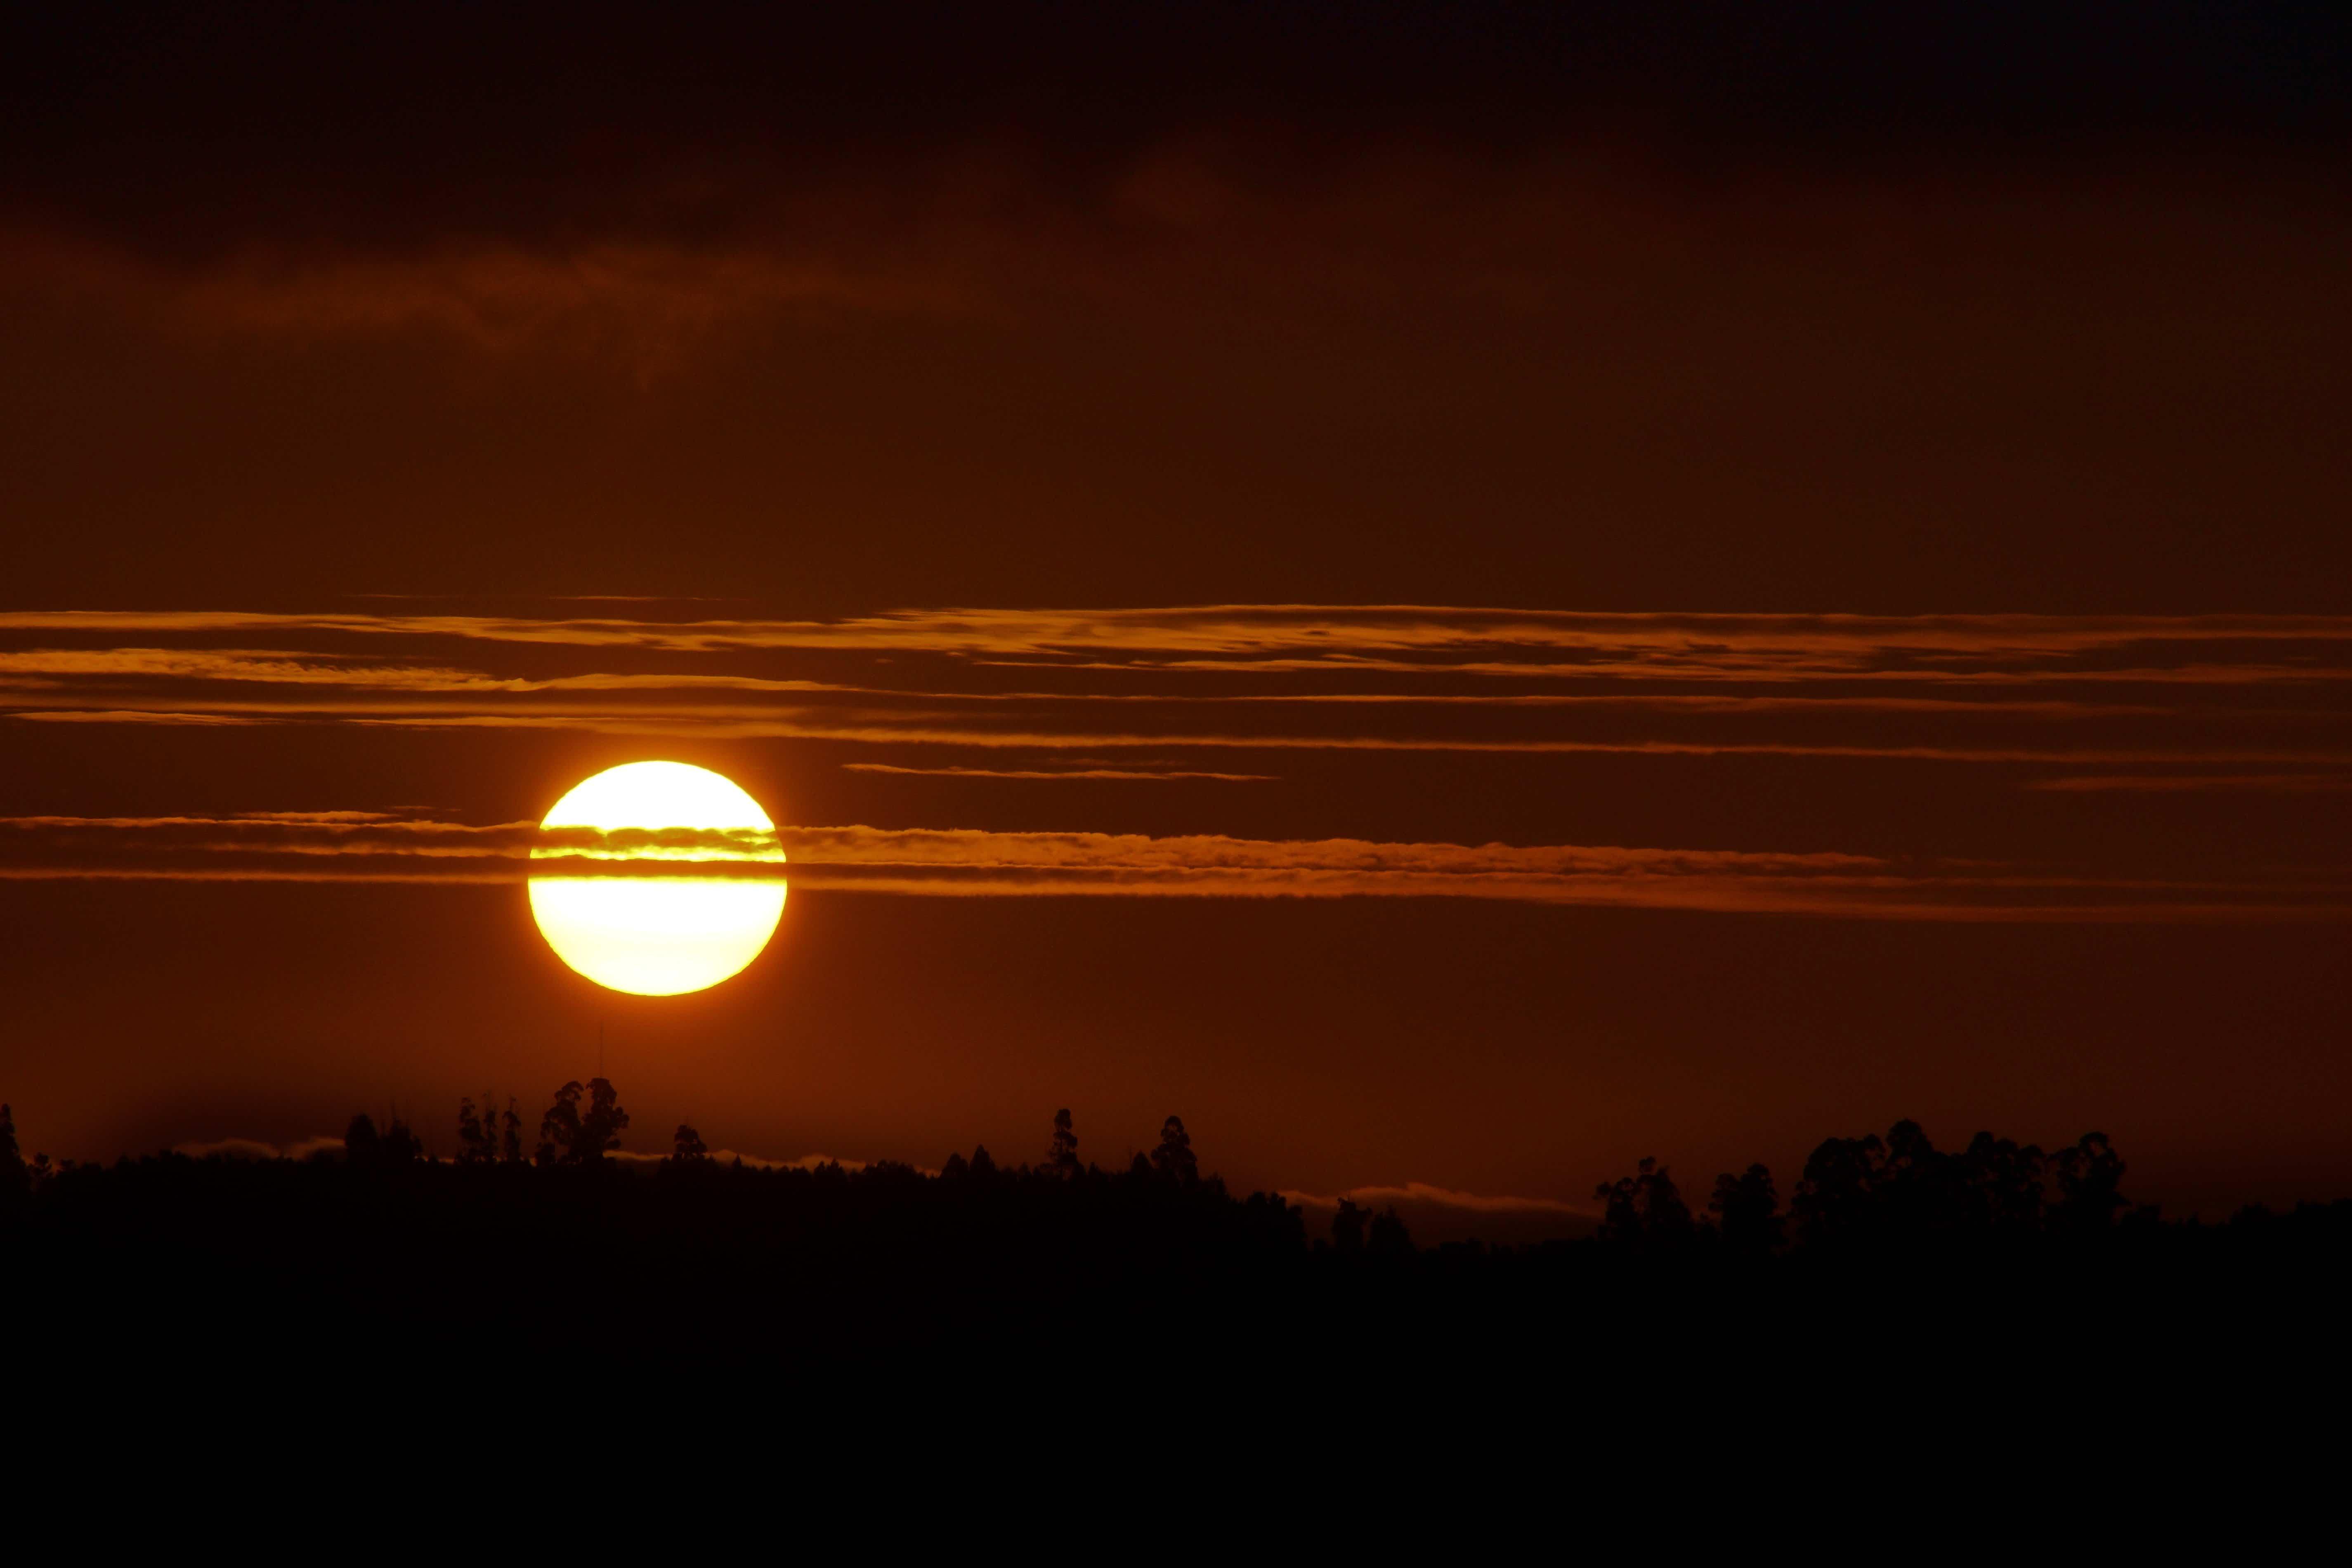 Free Picture  Sunrise  Night  Dark  Dawn  Dusk  Sun  Sky  Landscape  Silhouette